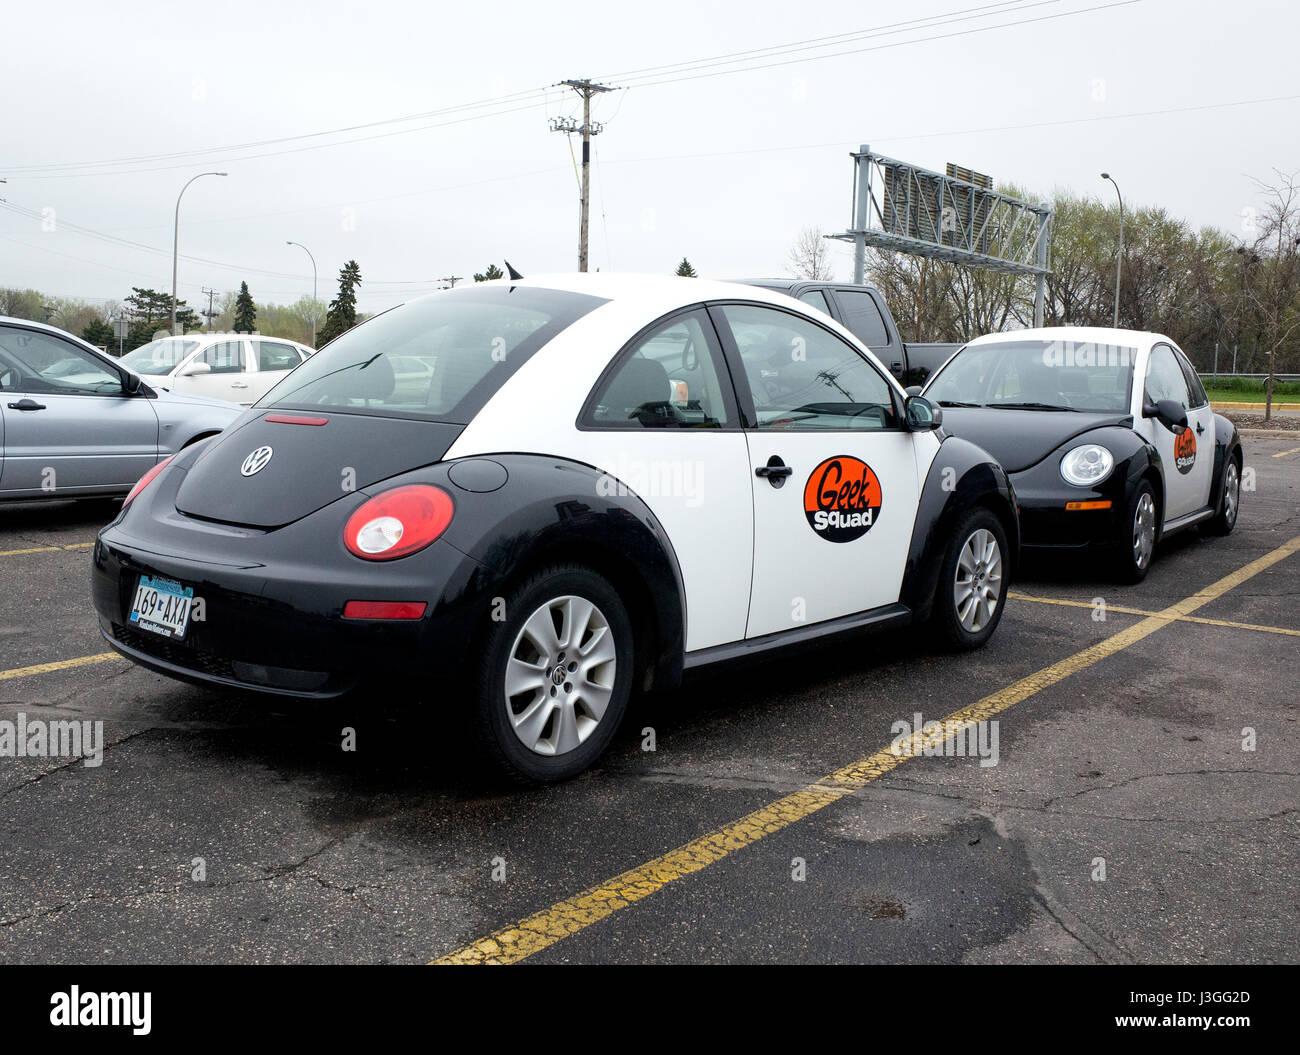 Best Buy Geek Squad Volkswagen Beetle Roseville Minnesota Mn Usa